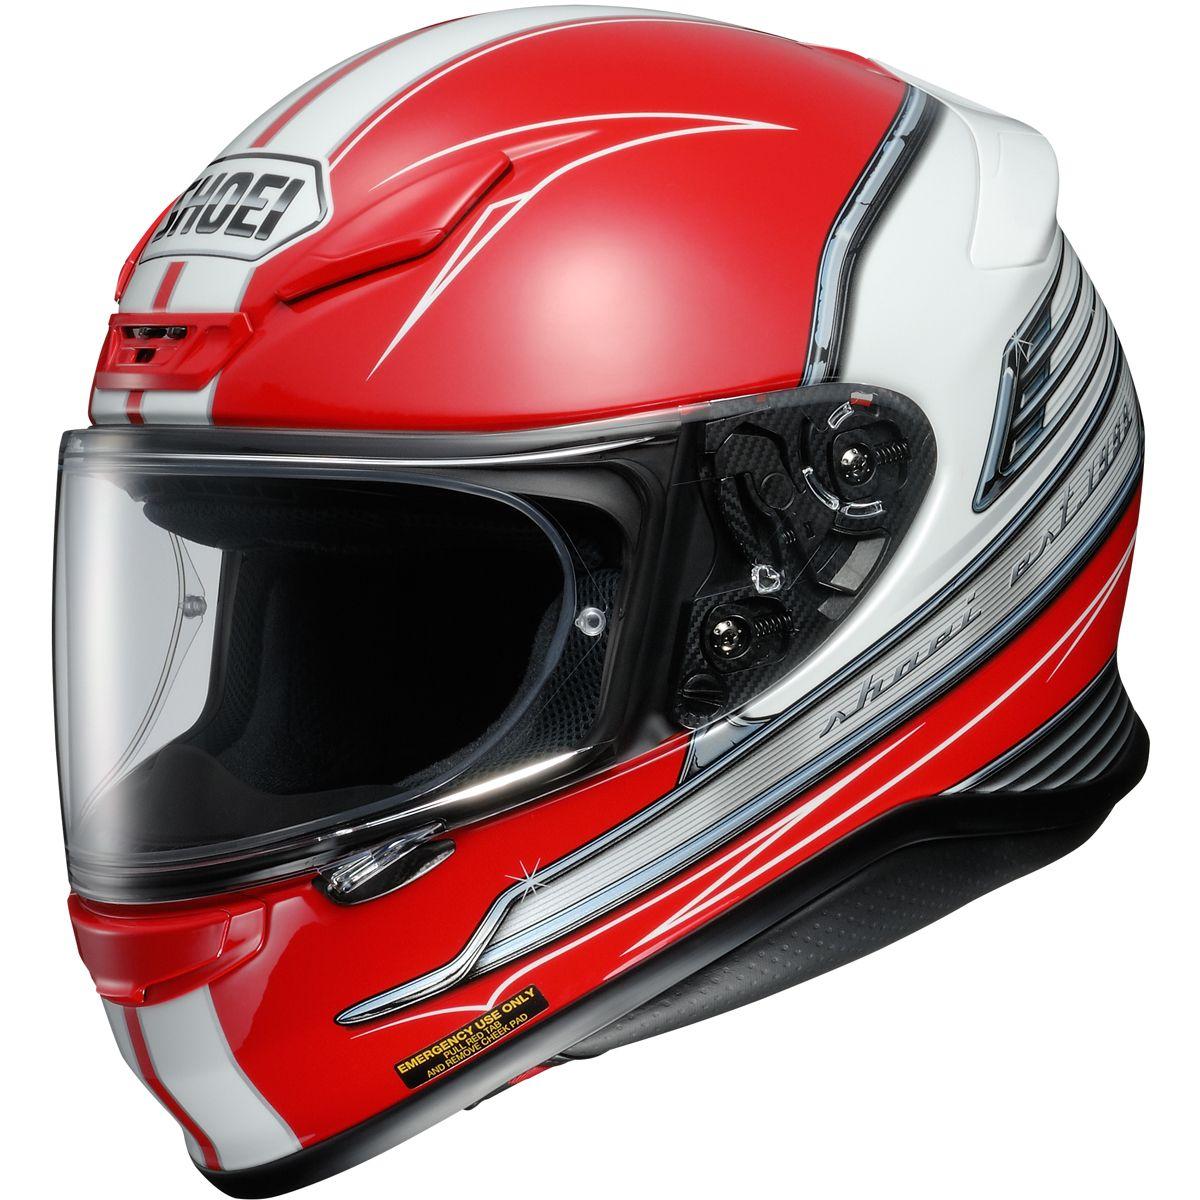 New Shoei Cruise RF1200 Sports Bike Motorcycle Helmet